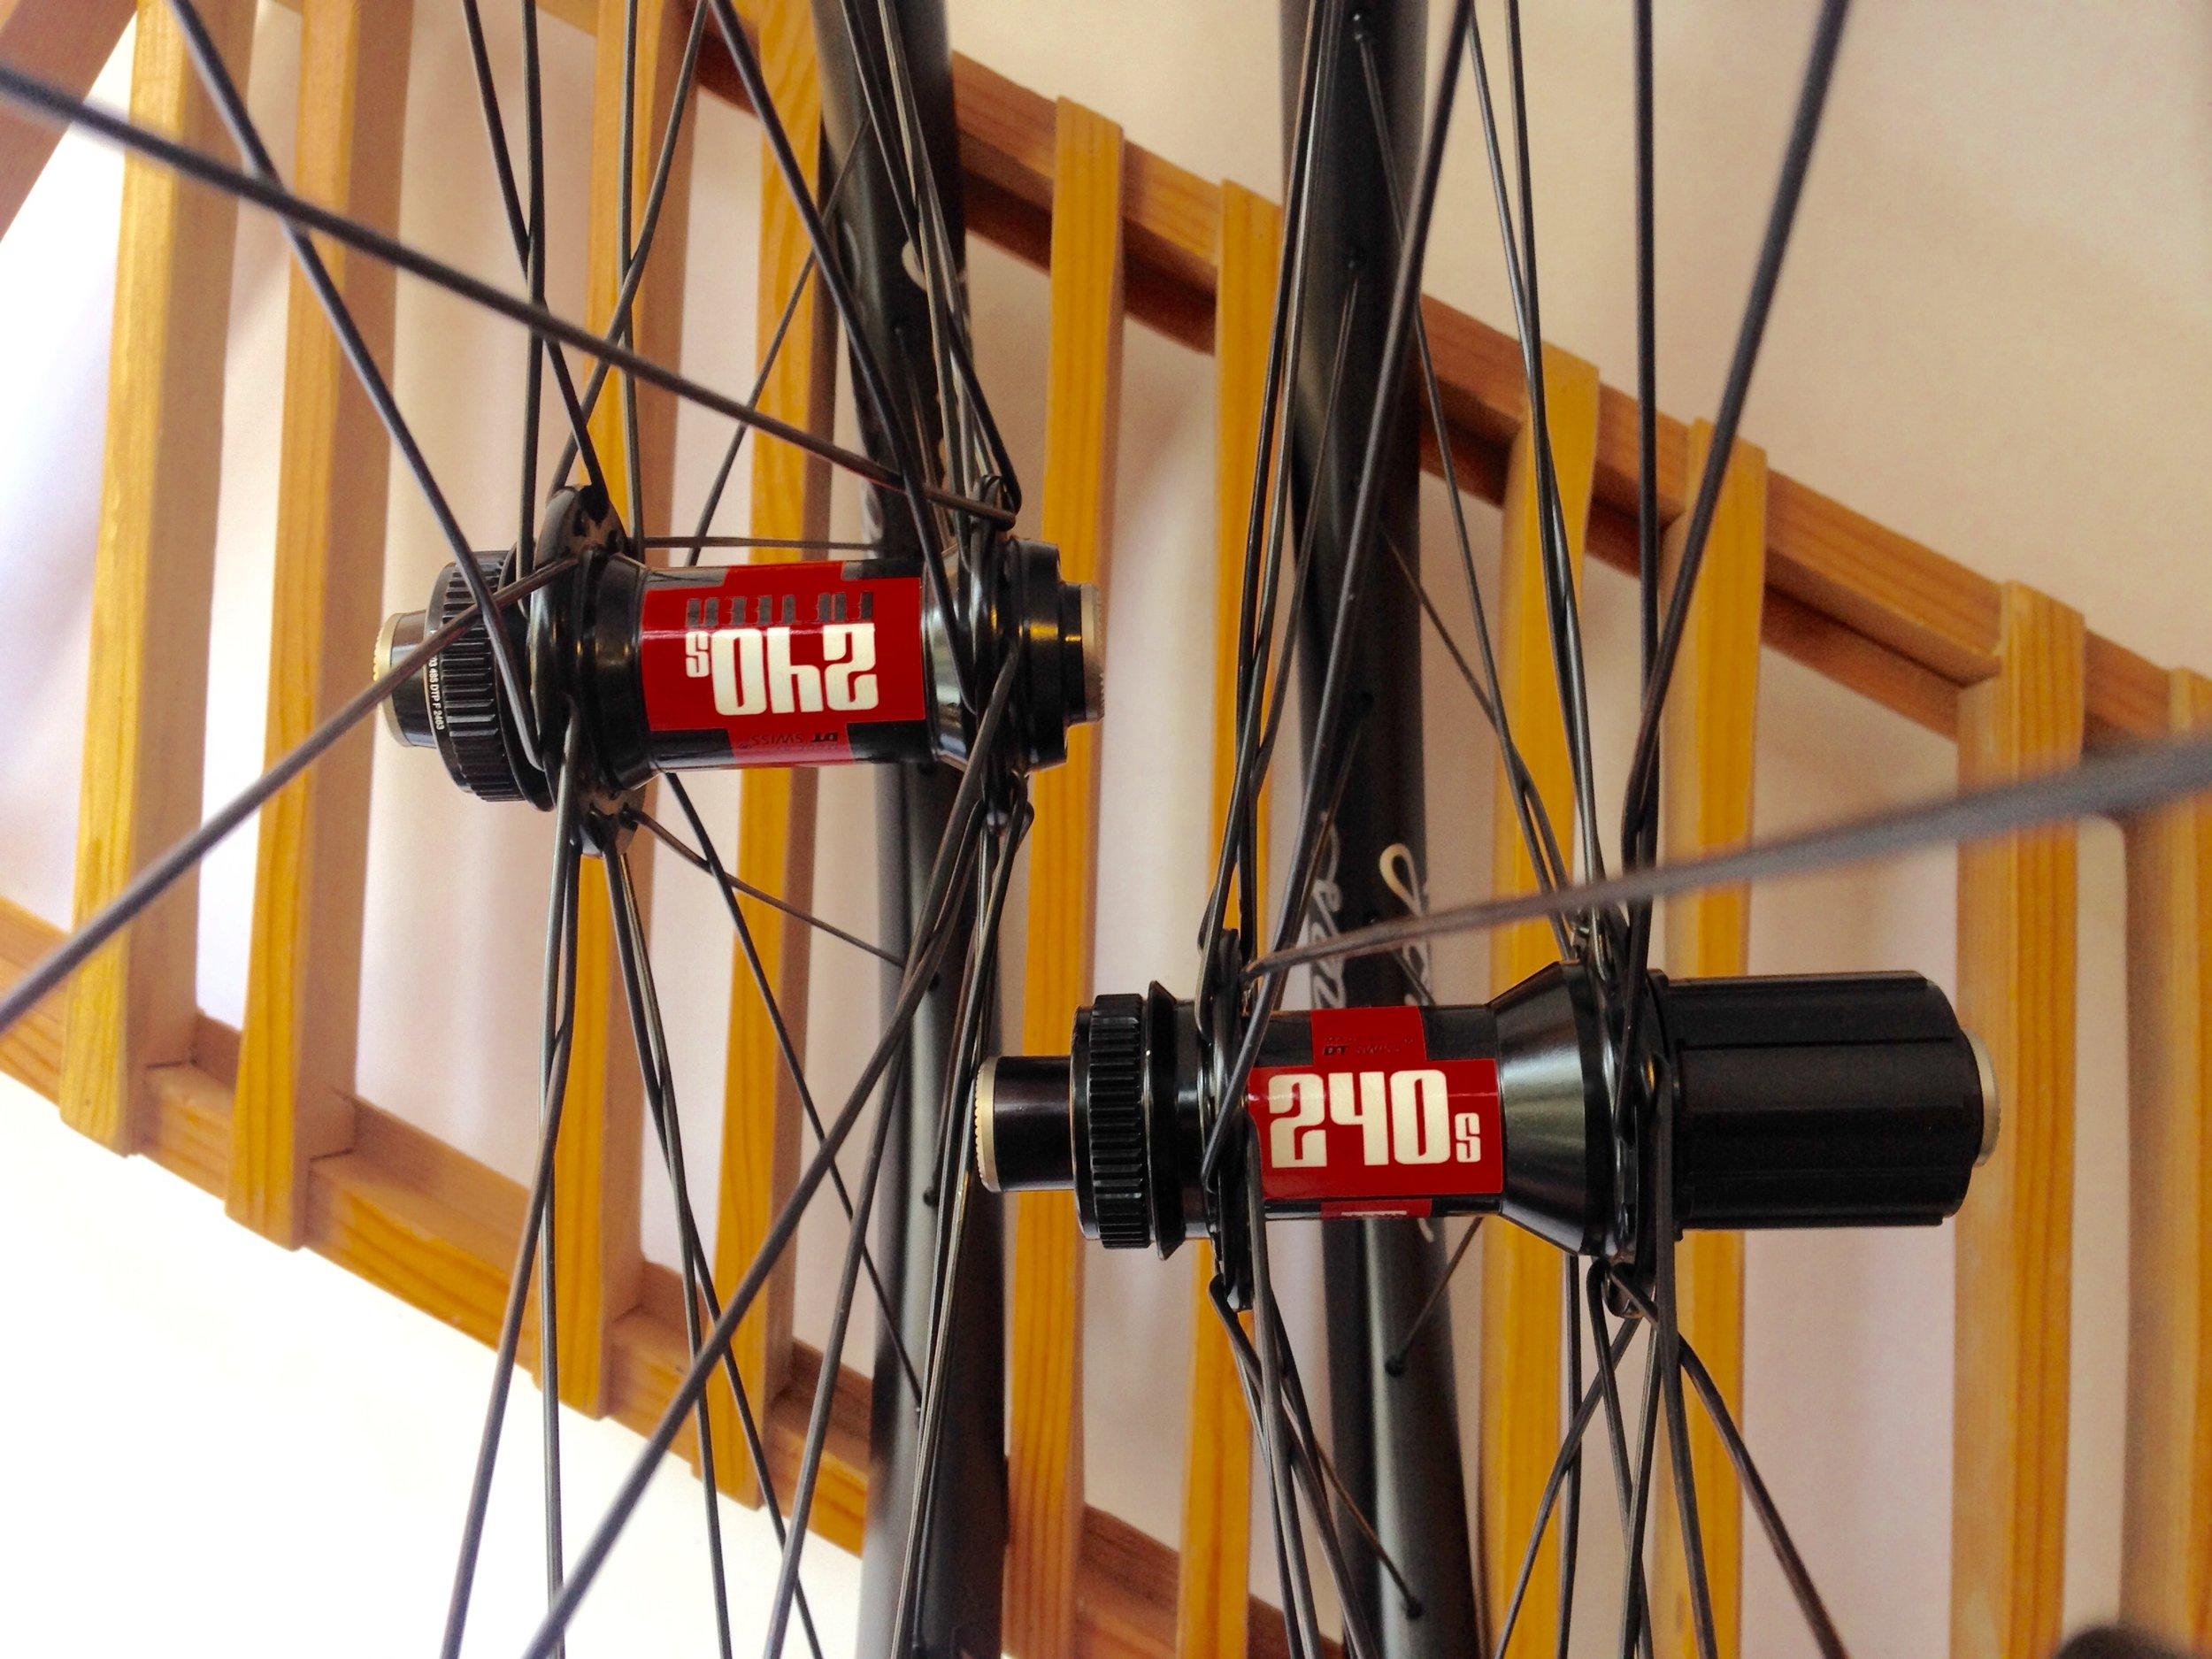 Light bicycle 26 on DT 240 4.jpg